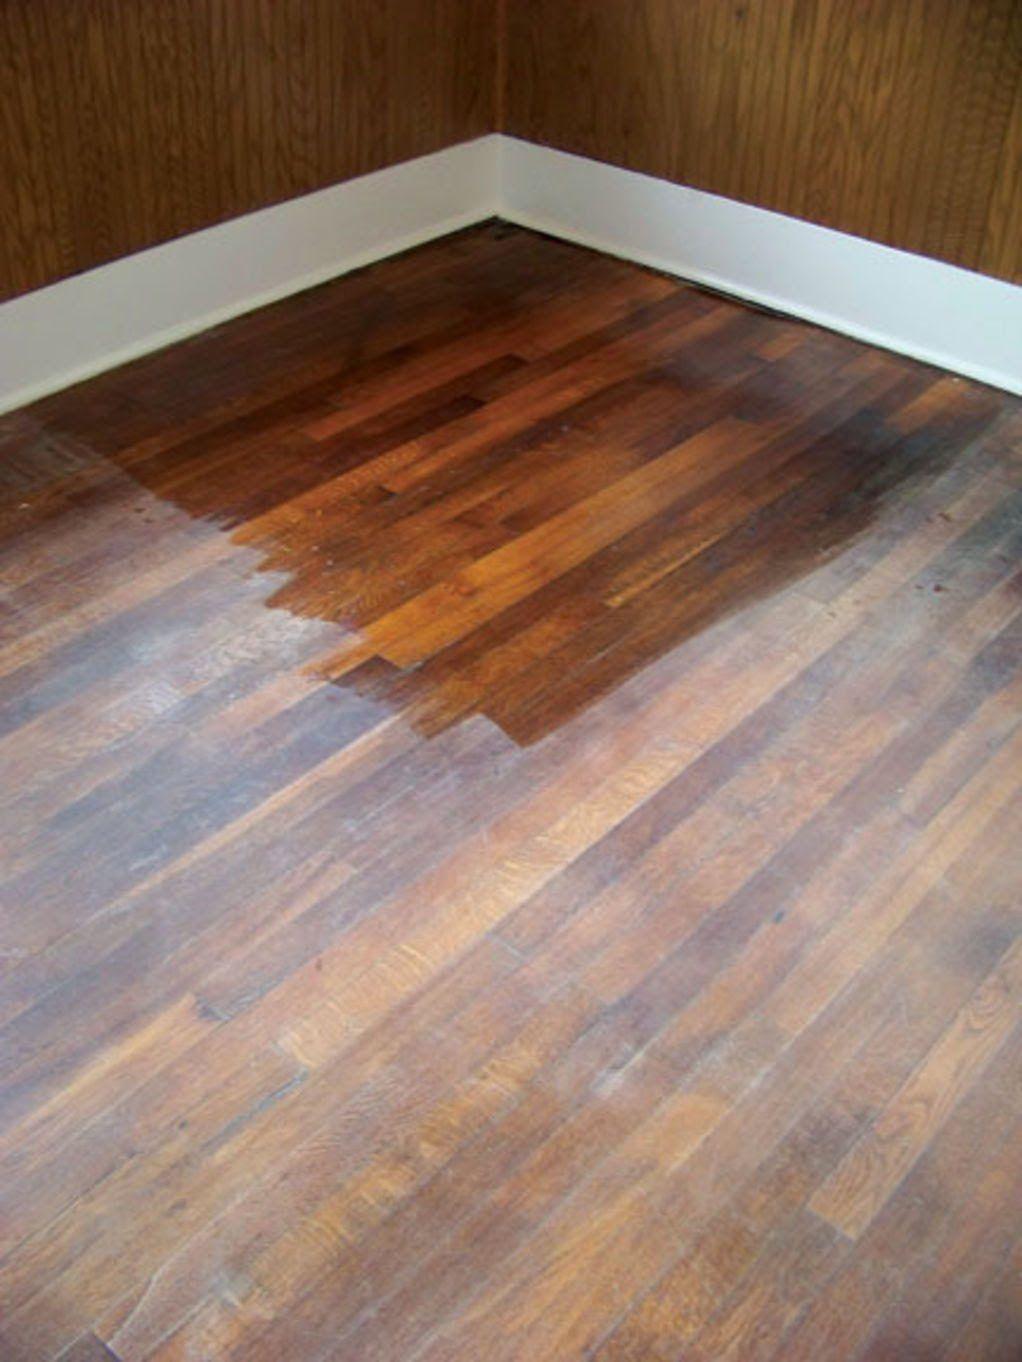 7 Steps To Like New Floors Refinish Wood Floors Floor Restoration Home Repairs